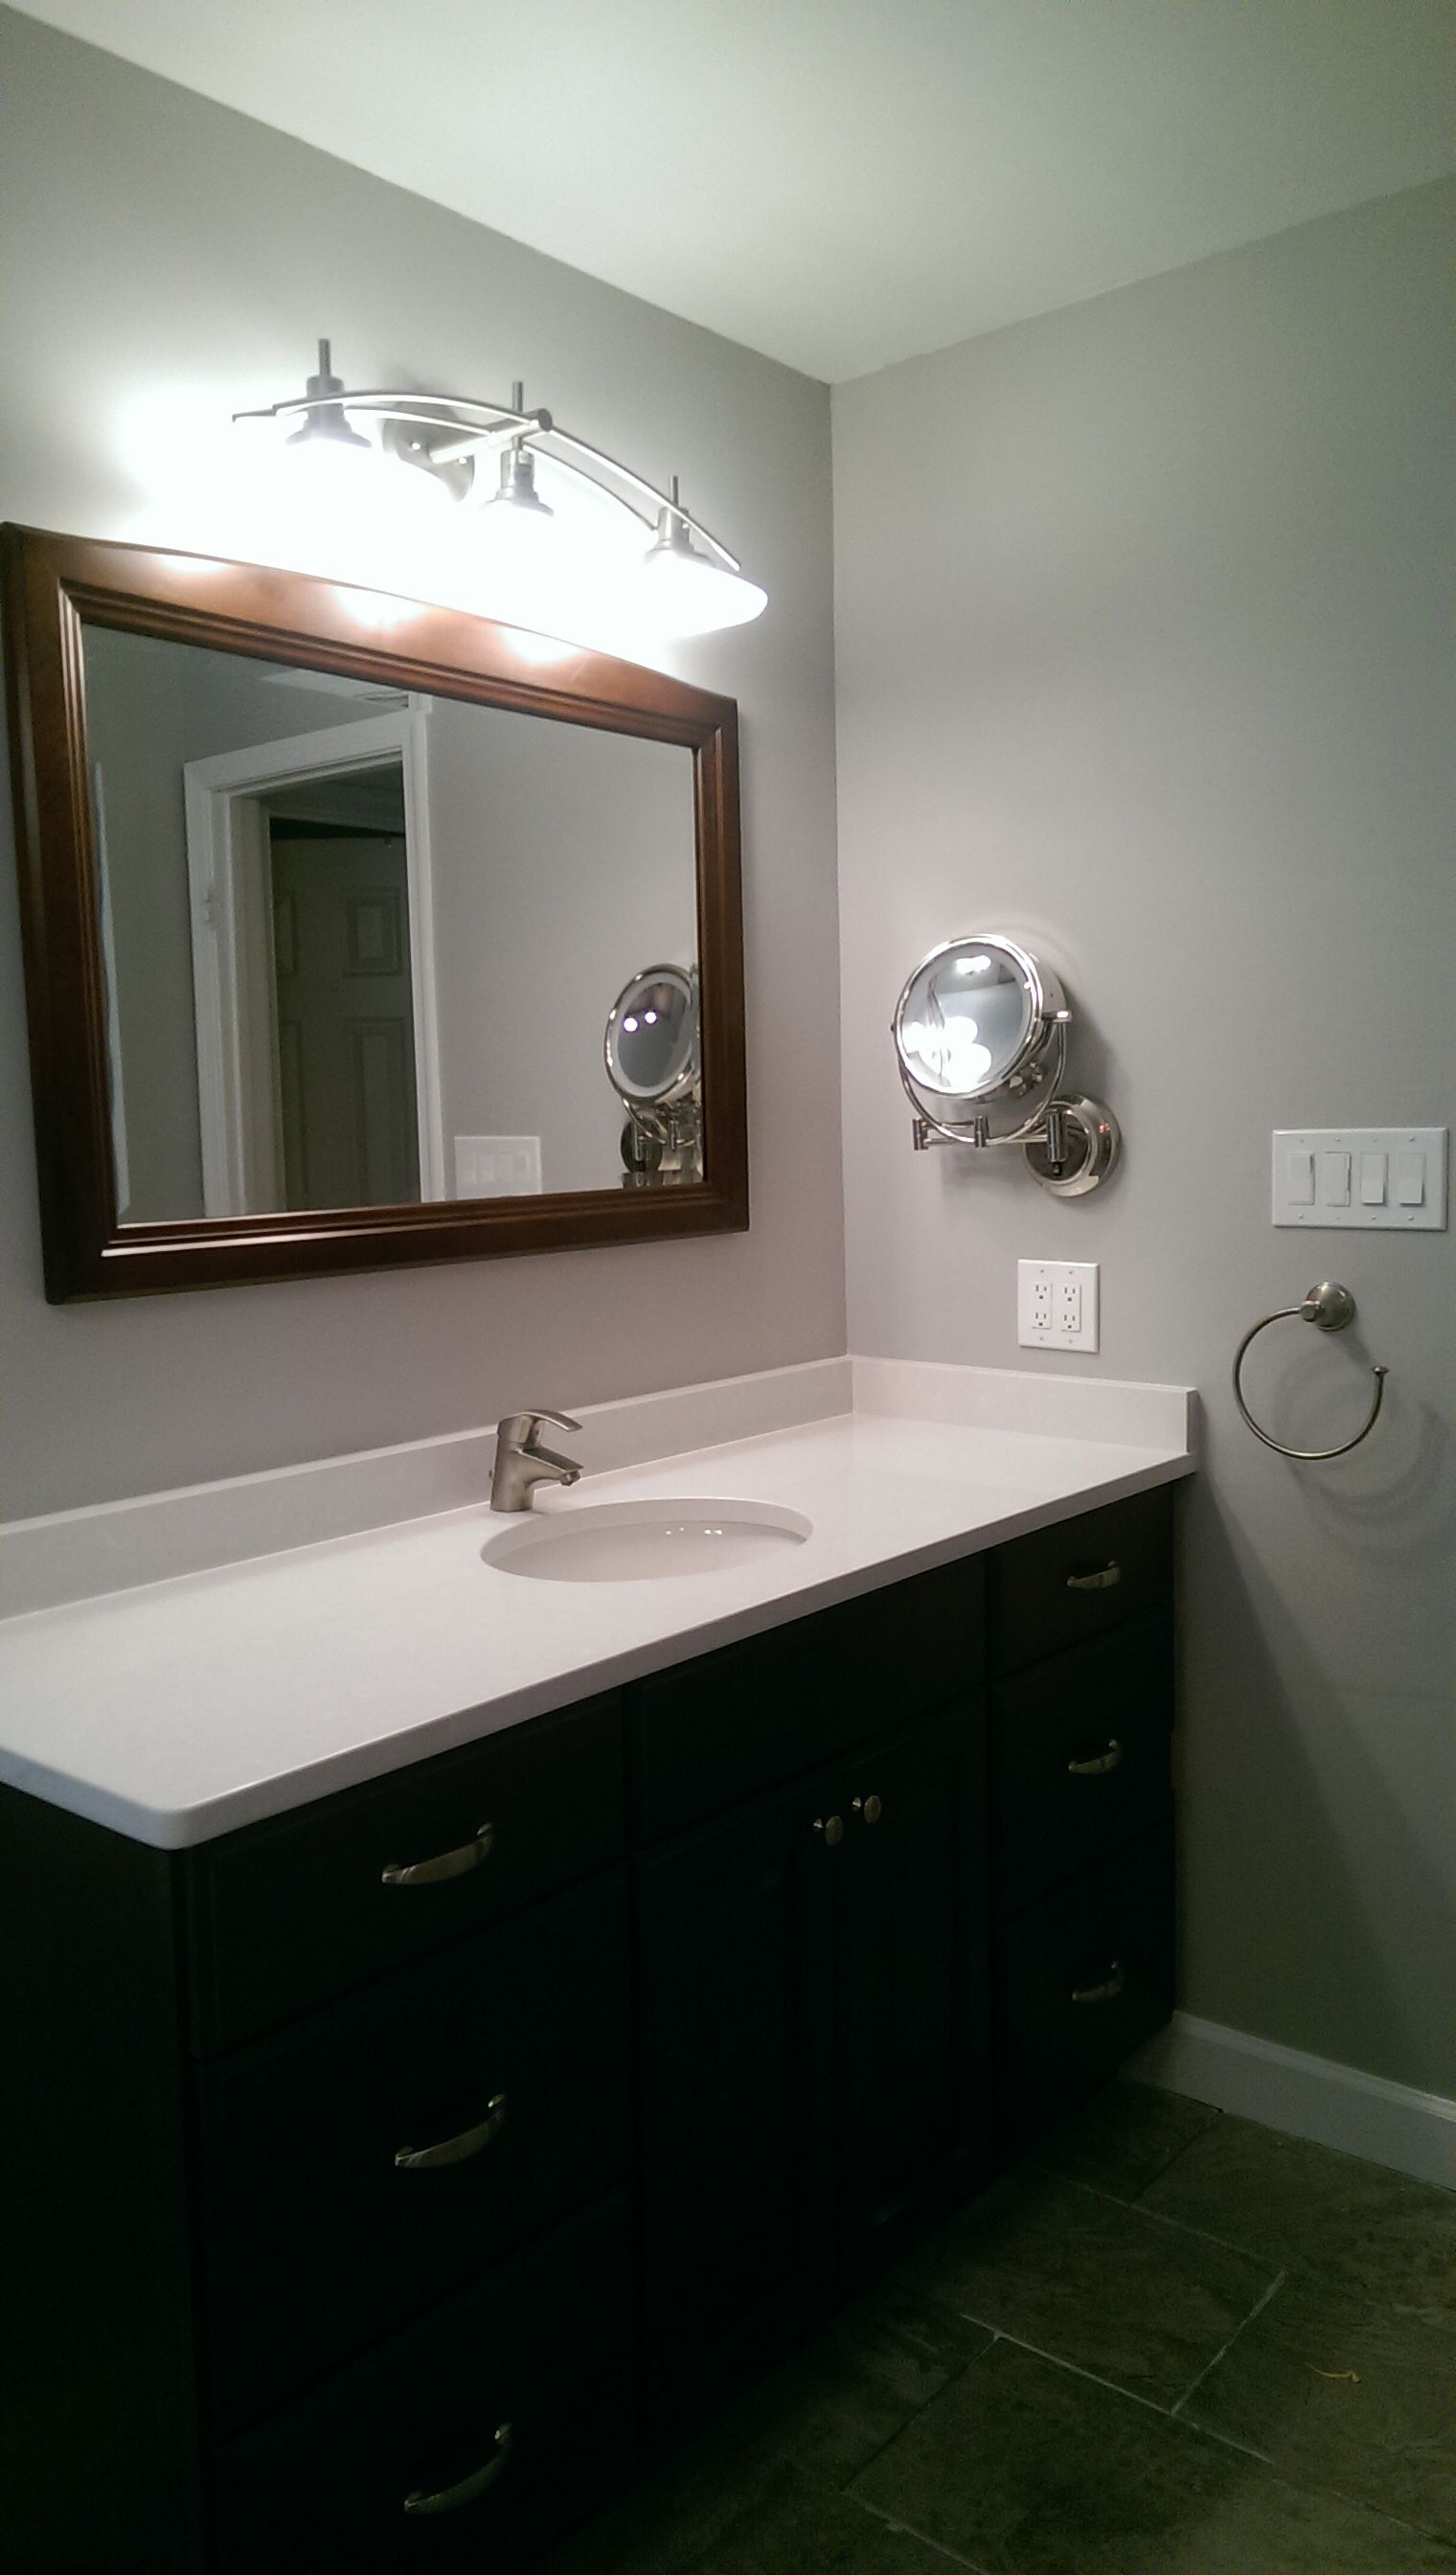 Master bathroom fairfax va, silestone Yukon blanco, grohe faucet ...